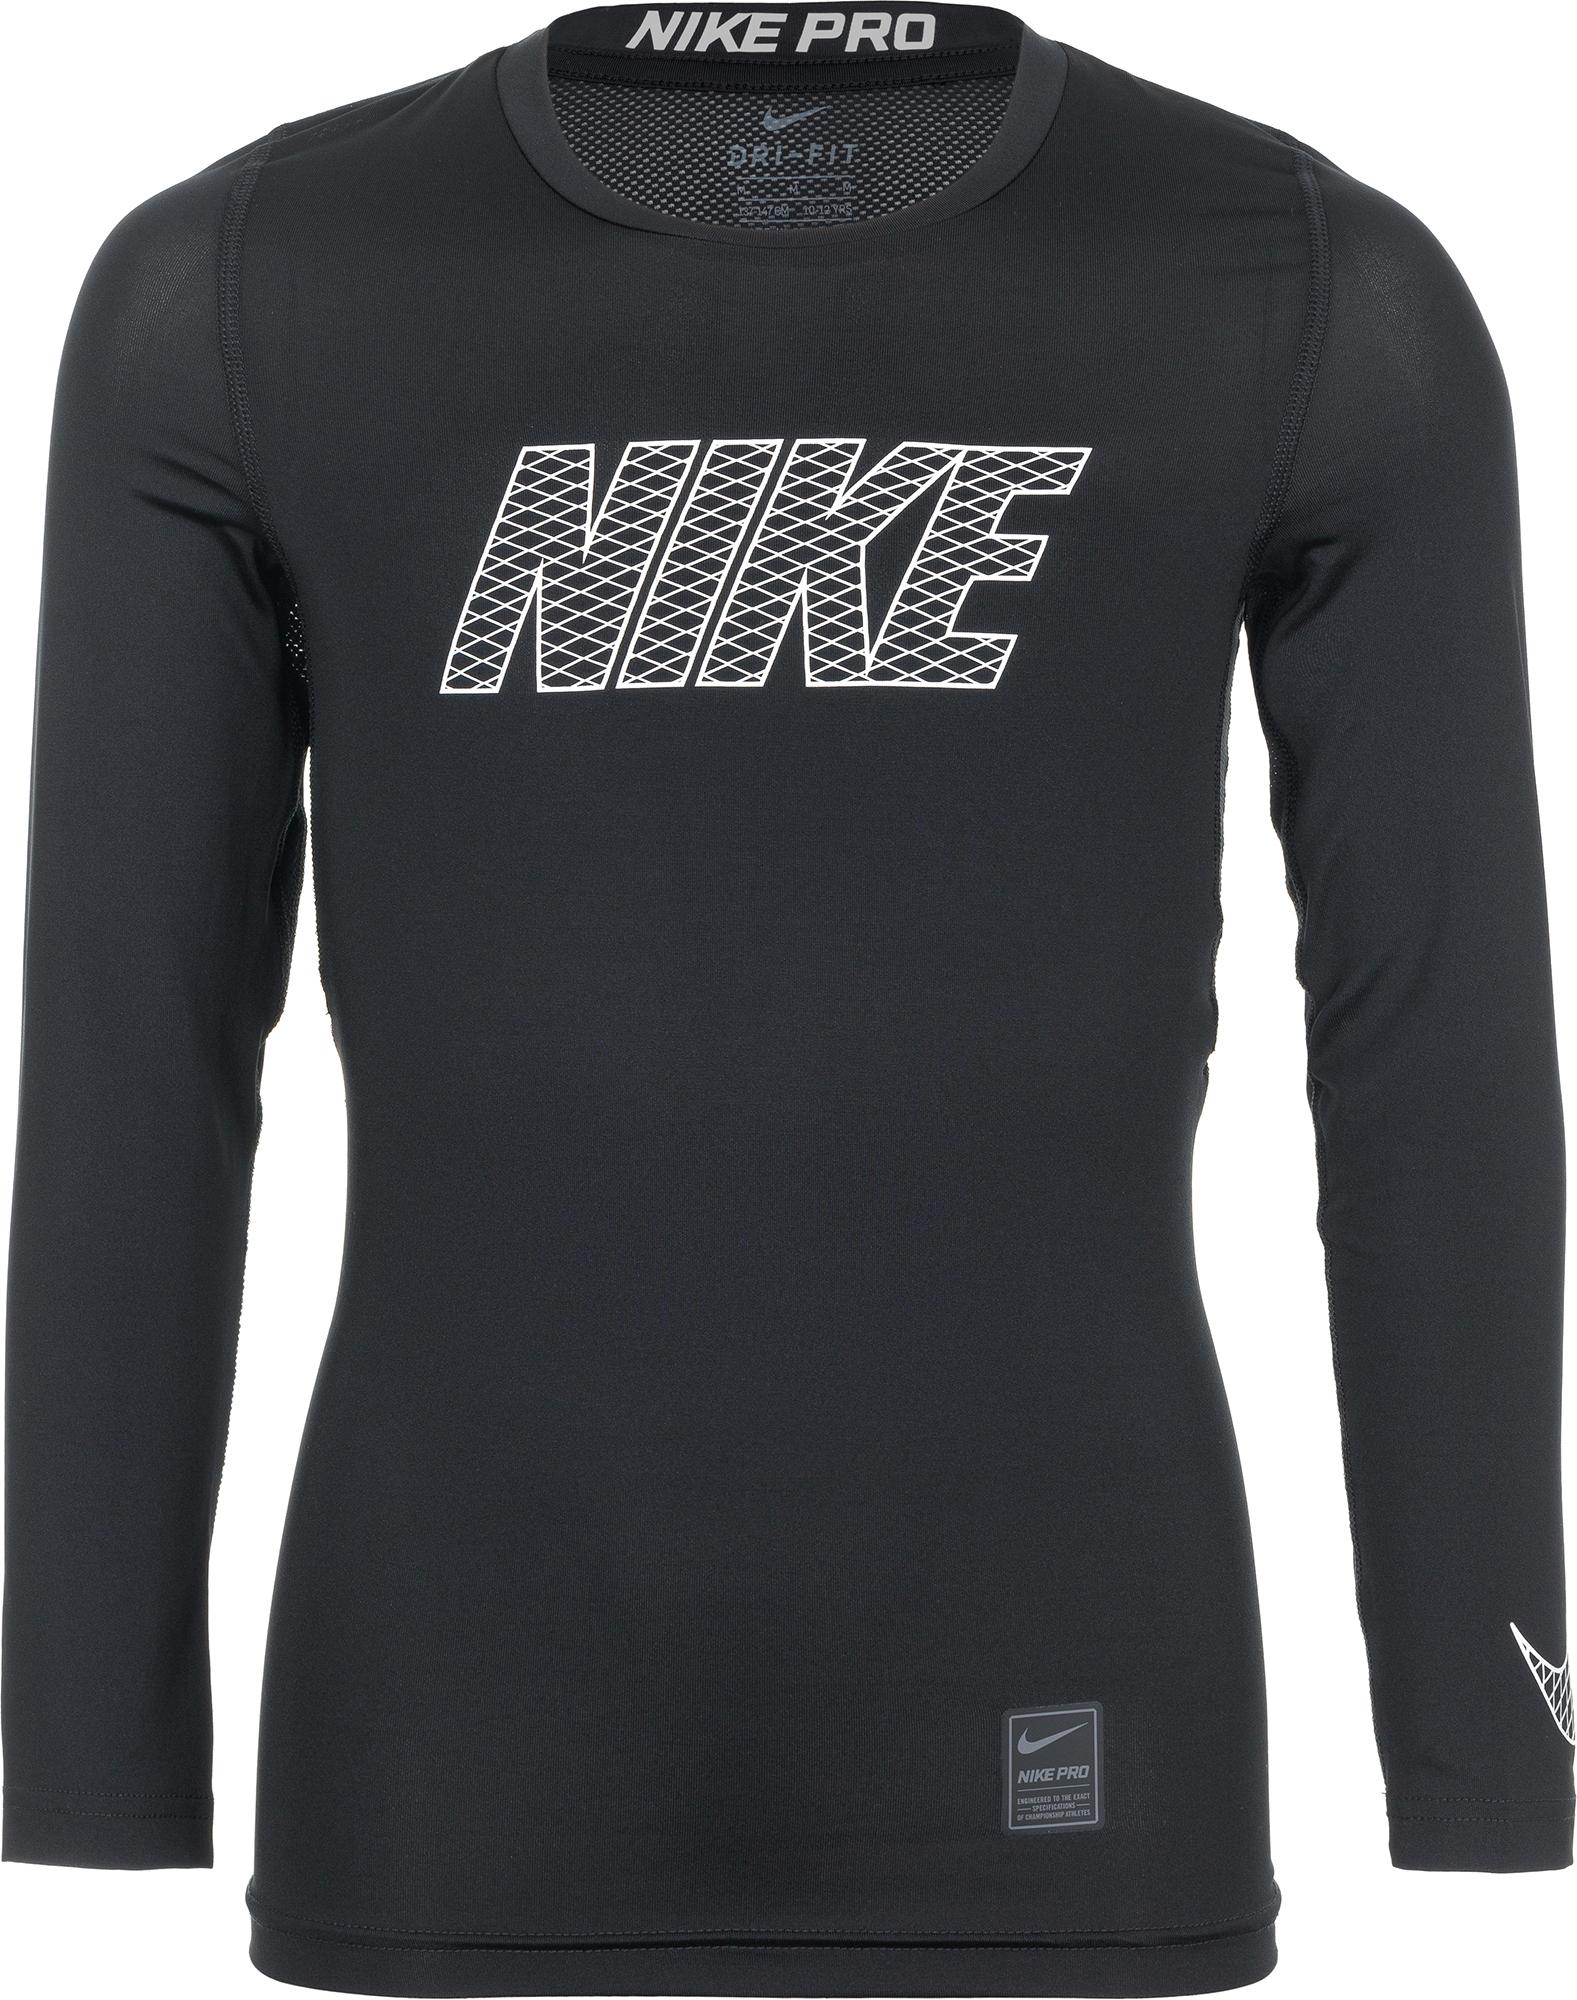 Nike Футболка с длинным рукавом для мальчиков Nike Pro, размер 158-170 цена